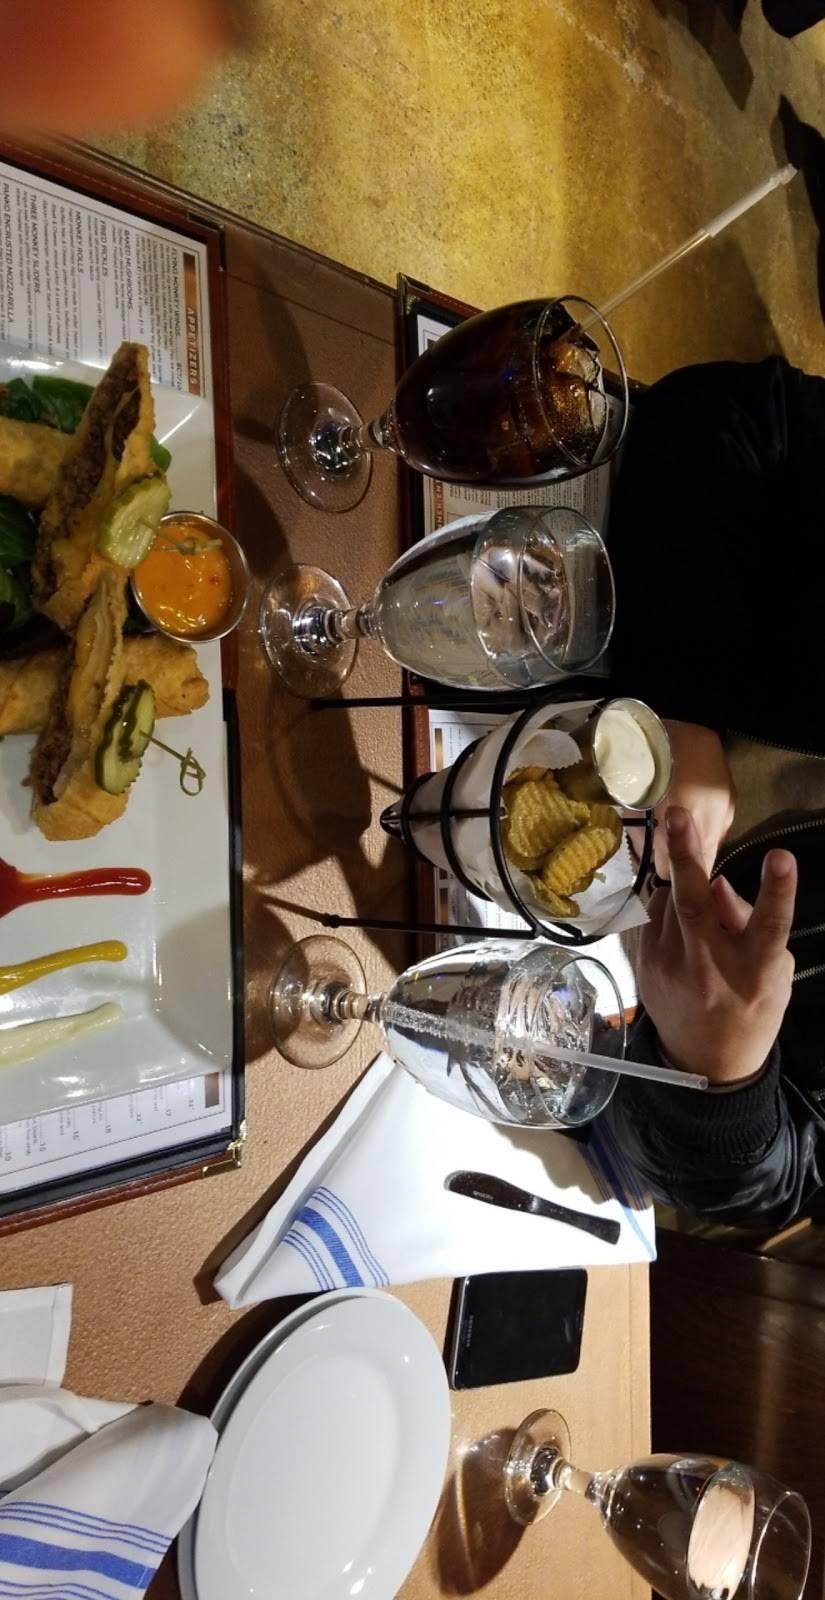 The Flying Monkey Grill & Bar | restaurant | 2095 Berlin Turnpike, Newington, CT 06111, USA | 8607264971 OR +1 860-726-4971